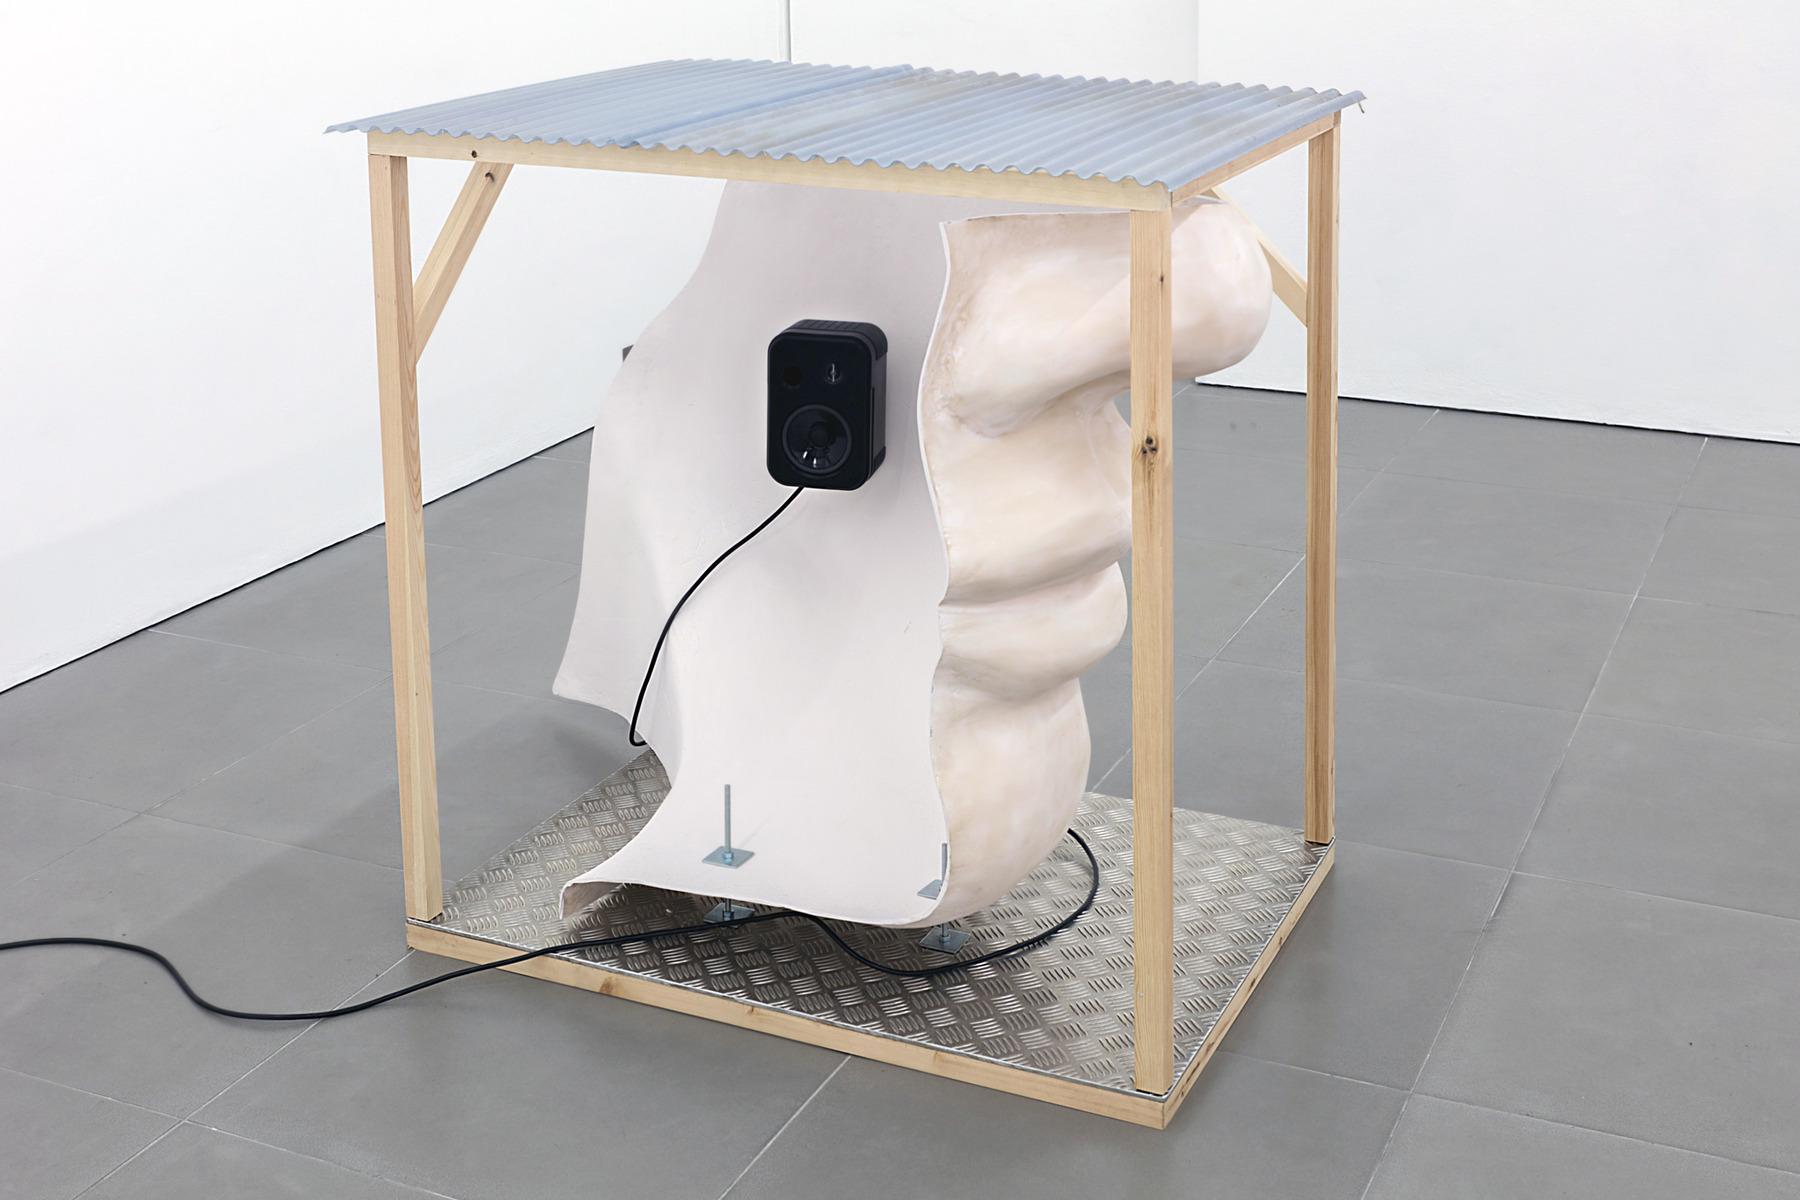 09. Anne de Vries, SUBMISSION 2015, wood, metal, fibreglass resin, audio, video